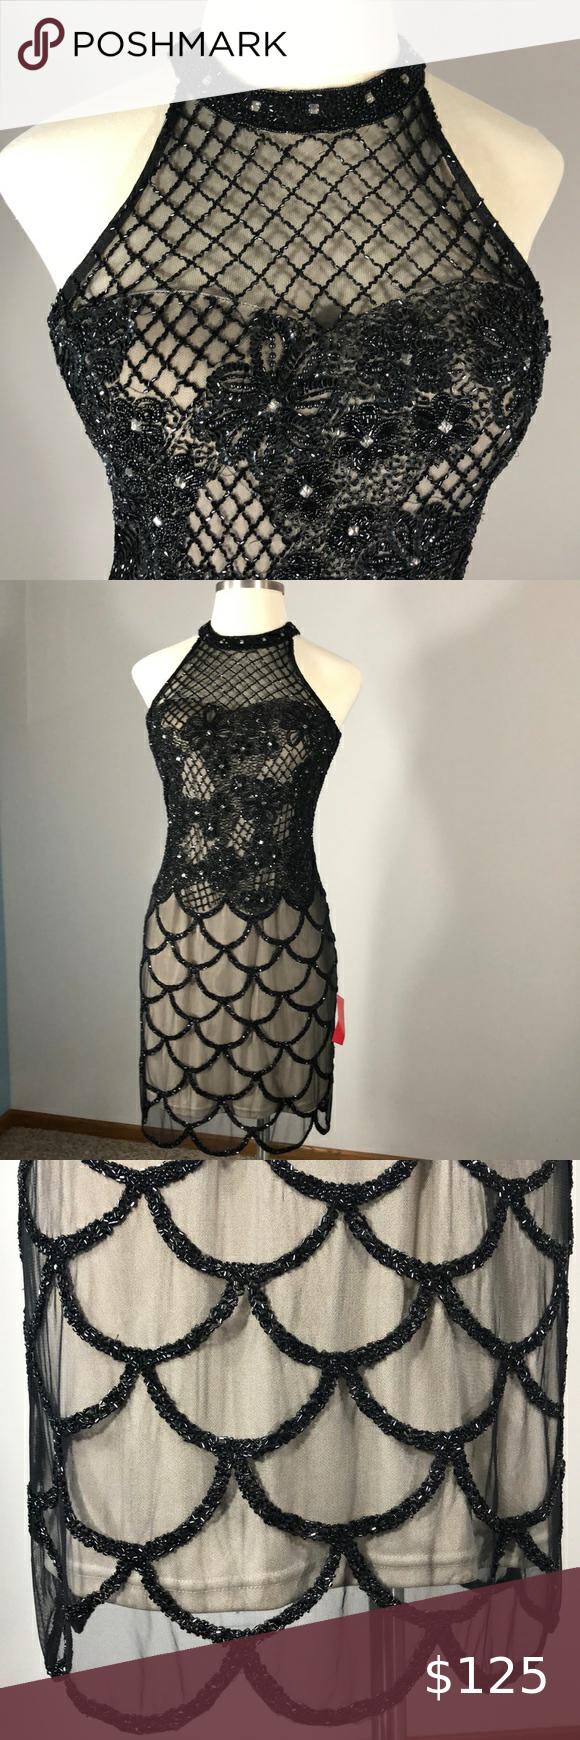 Gatsbylady London designer beaded dress #gatsbylady #londonstyle #highfashion #girlboss Gatsbylady Dresses